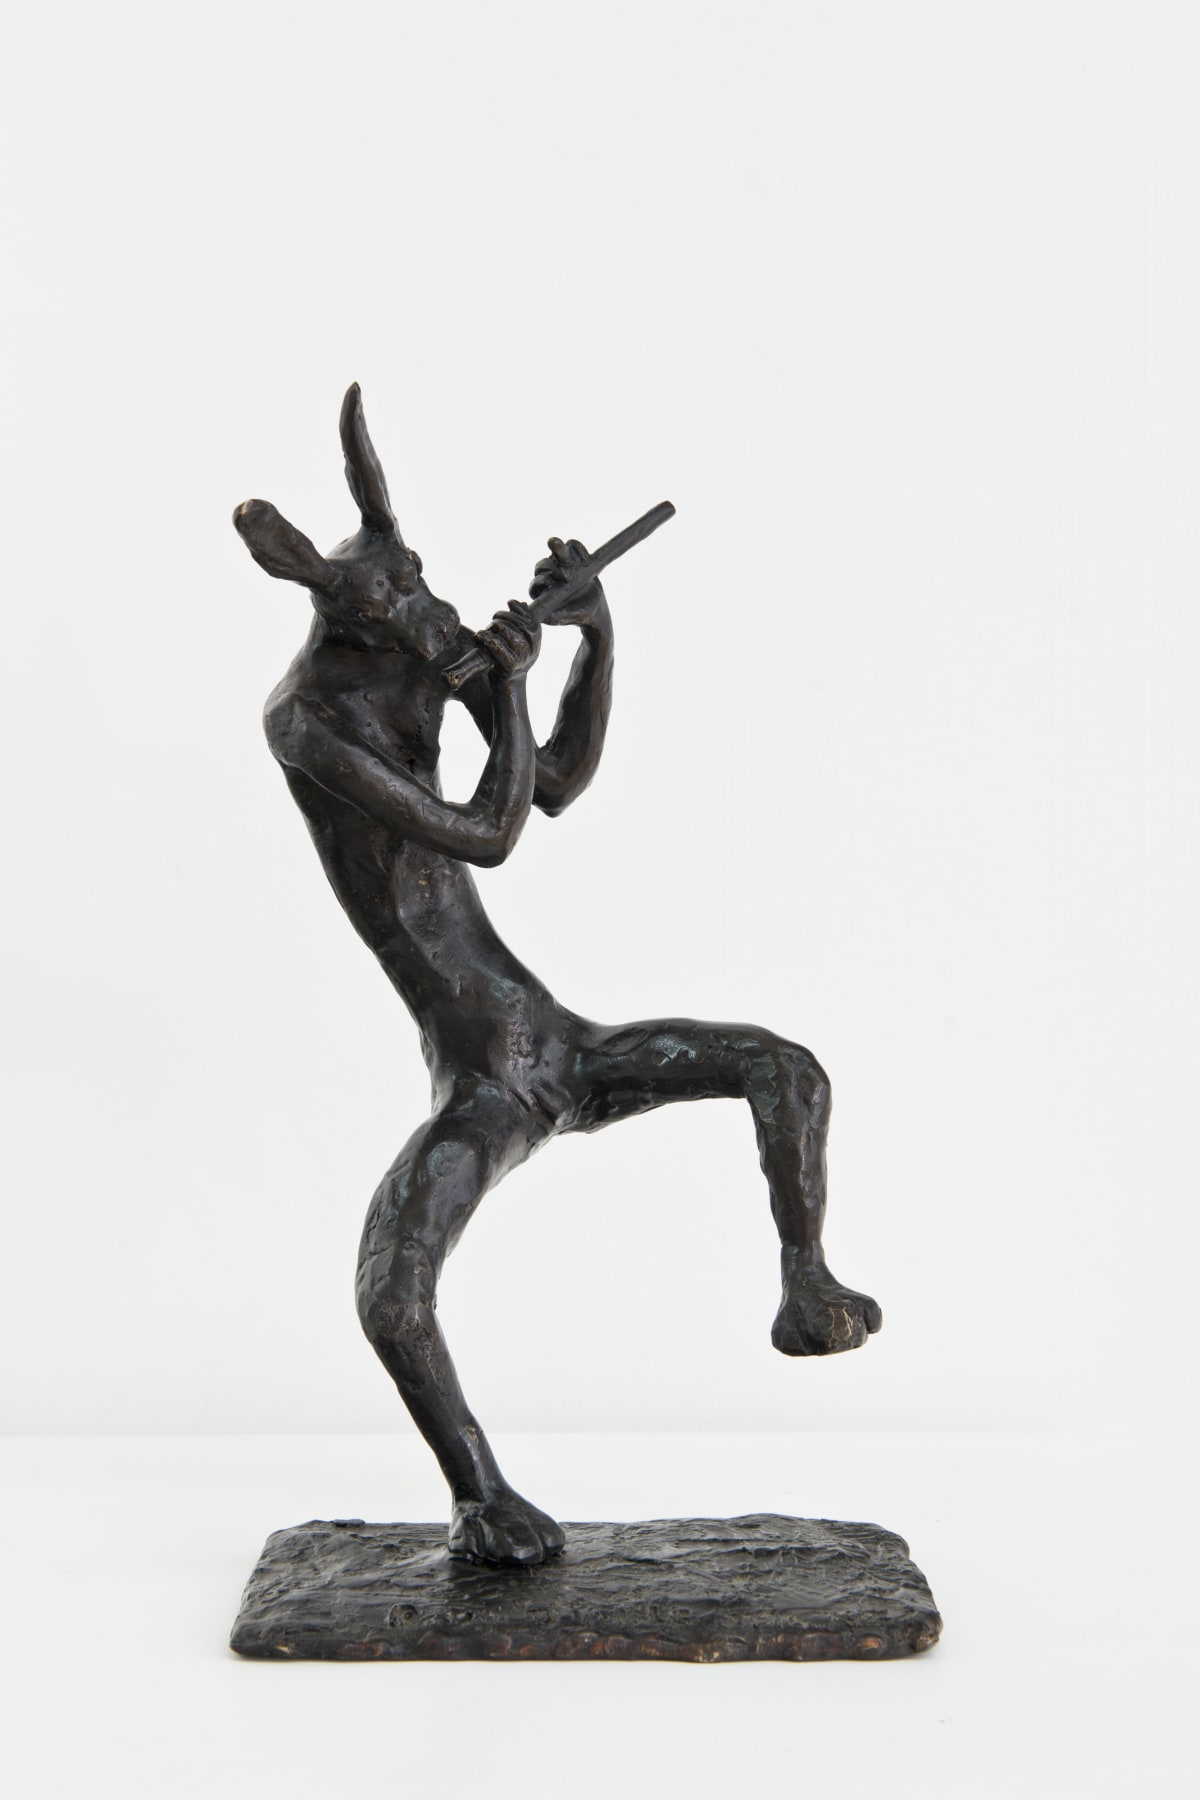 Paul DIBBLE Rabbit Rhythms, 2014 Cast Patinated Bronze 13.4 x 5.9 x 7.9 in 34 x 15 x 20 cm #2/2